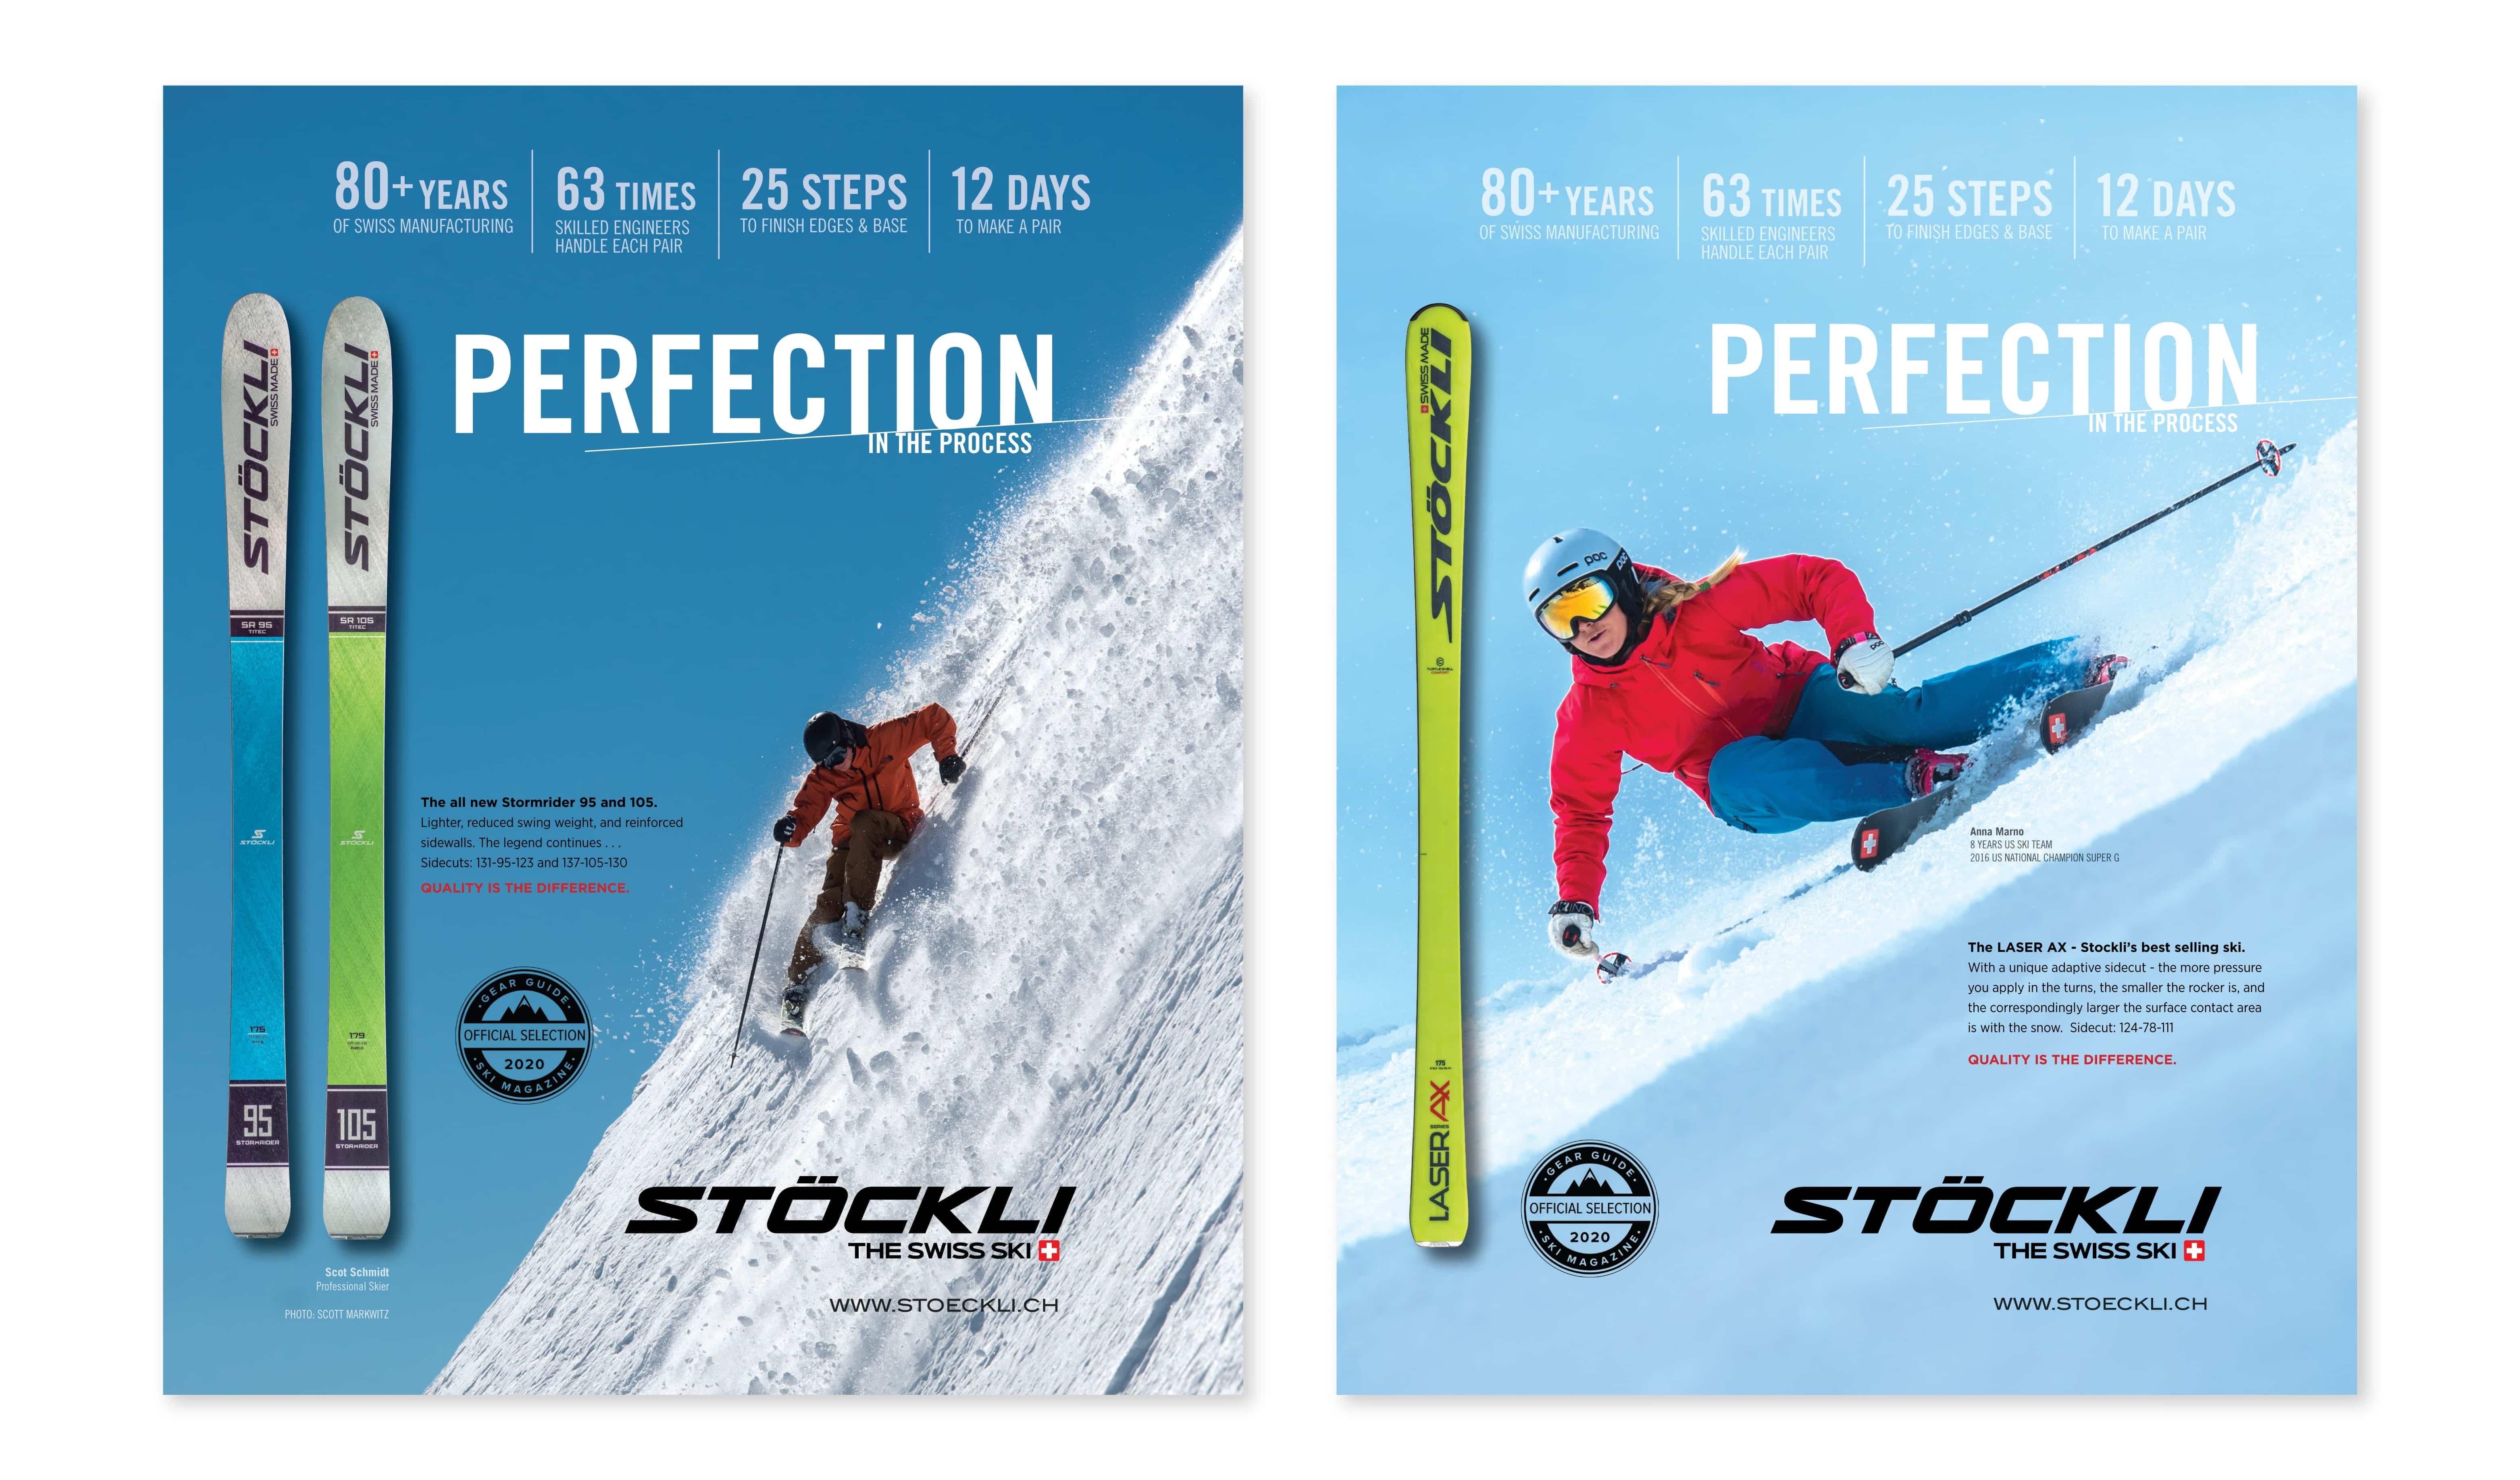 Stockli Print Ads